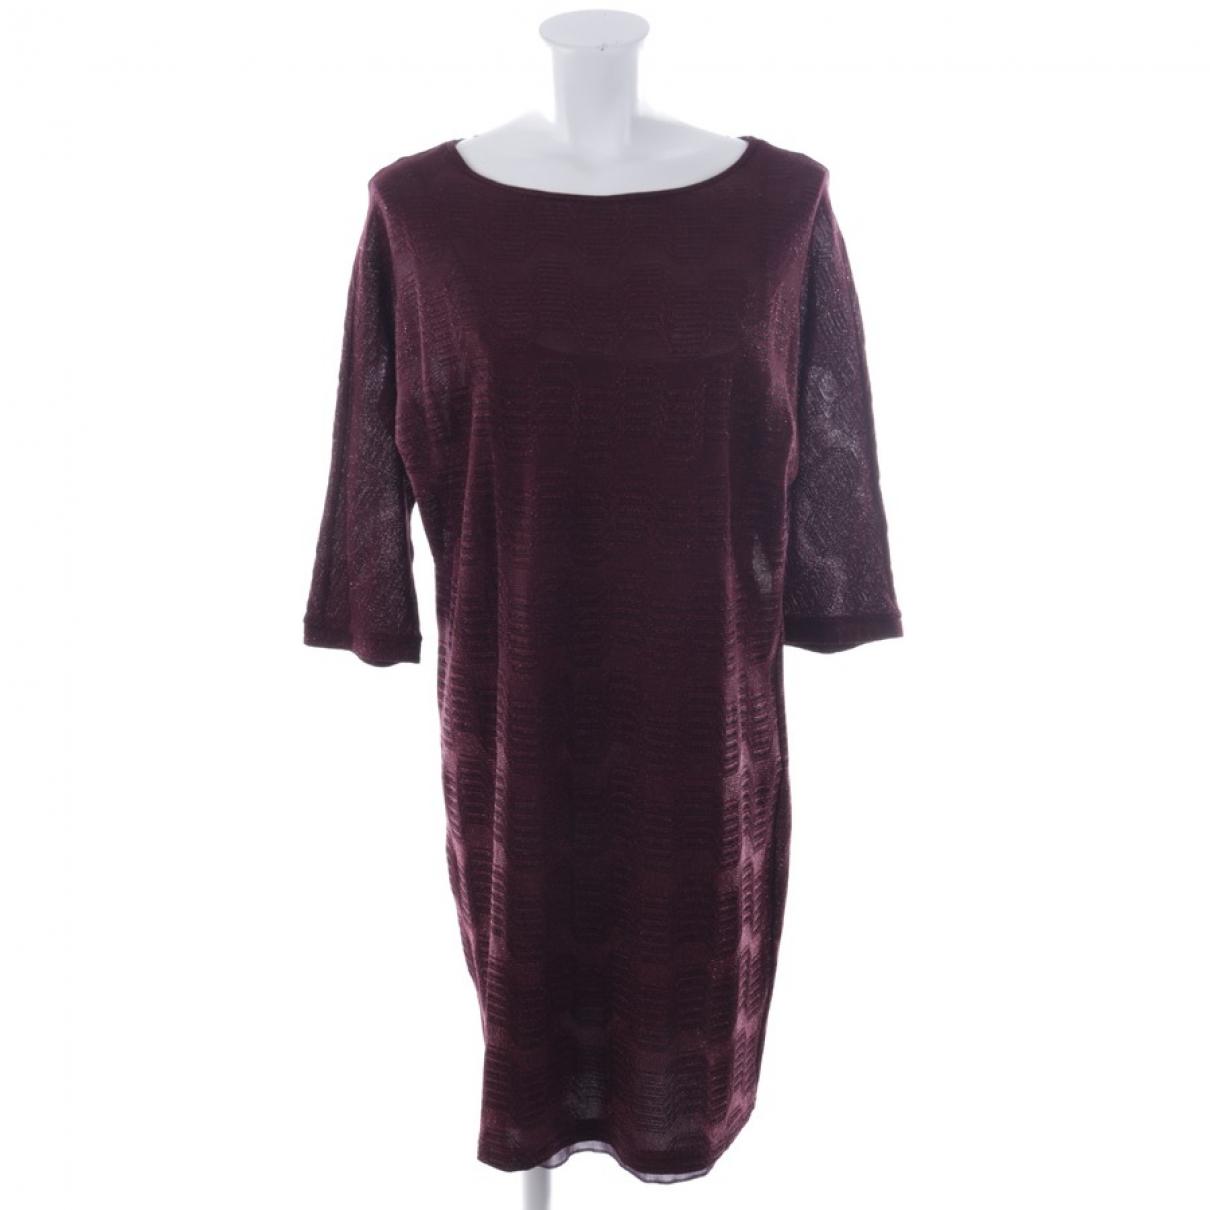 M Missoni \N Red dress for Women M International